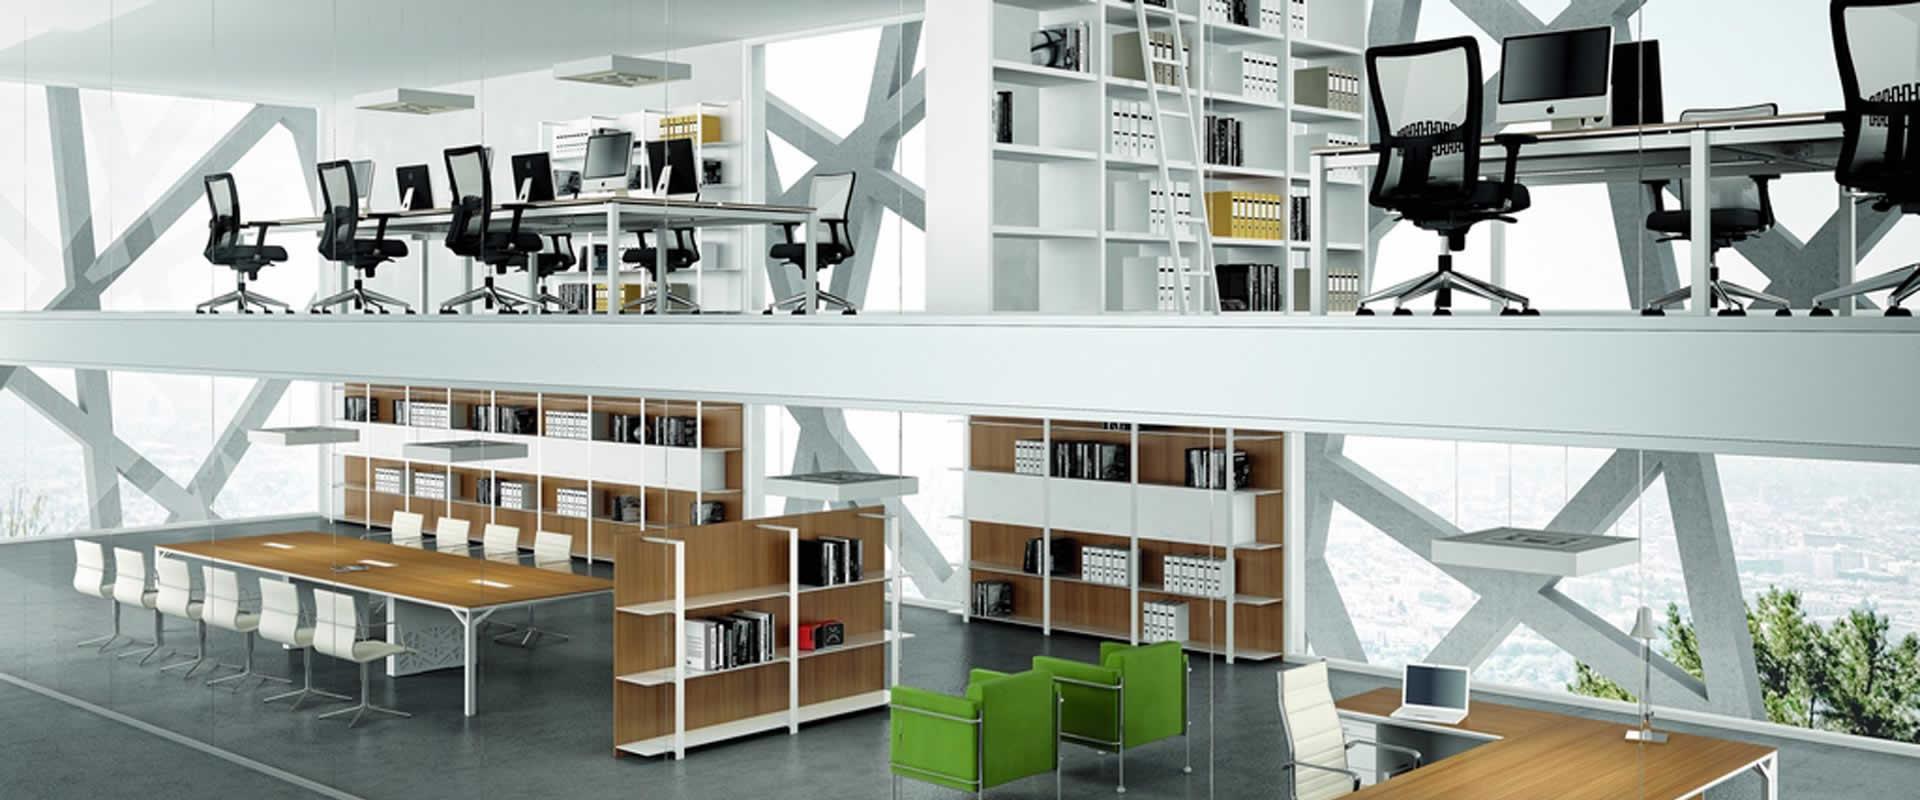 03-slide-oficinas-ideal